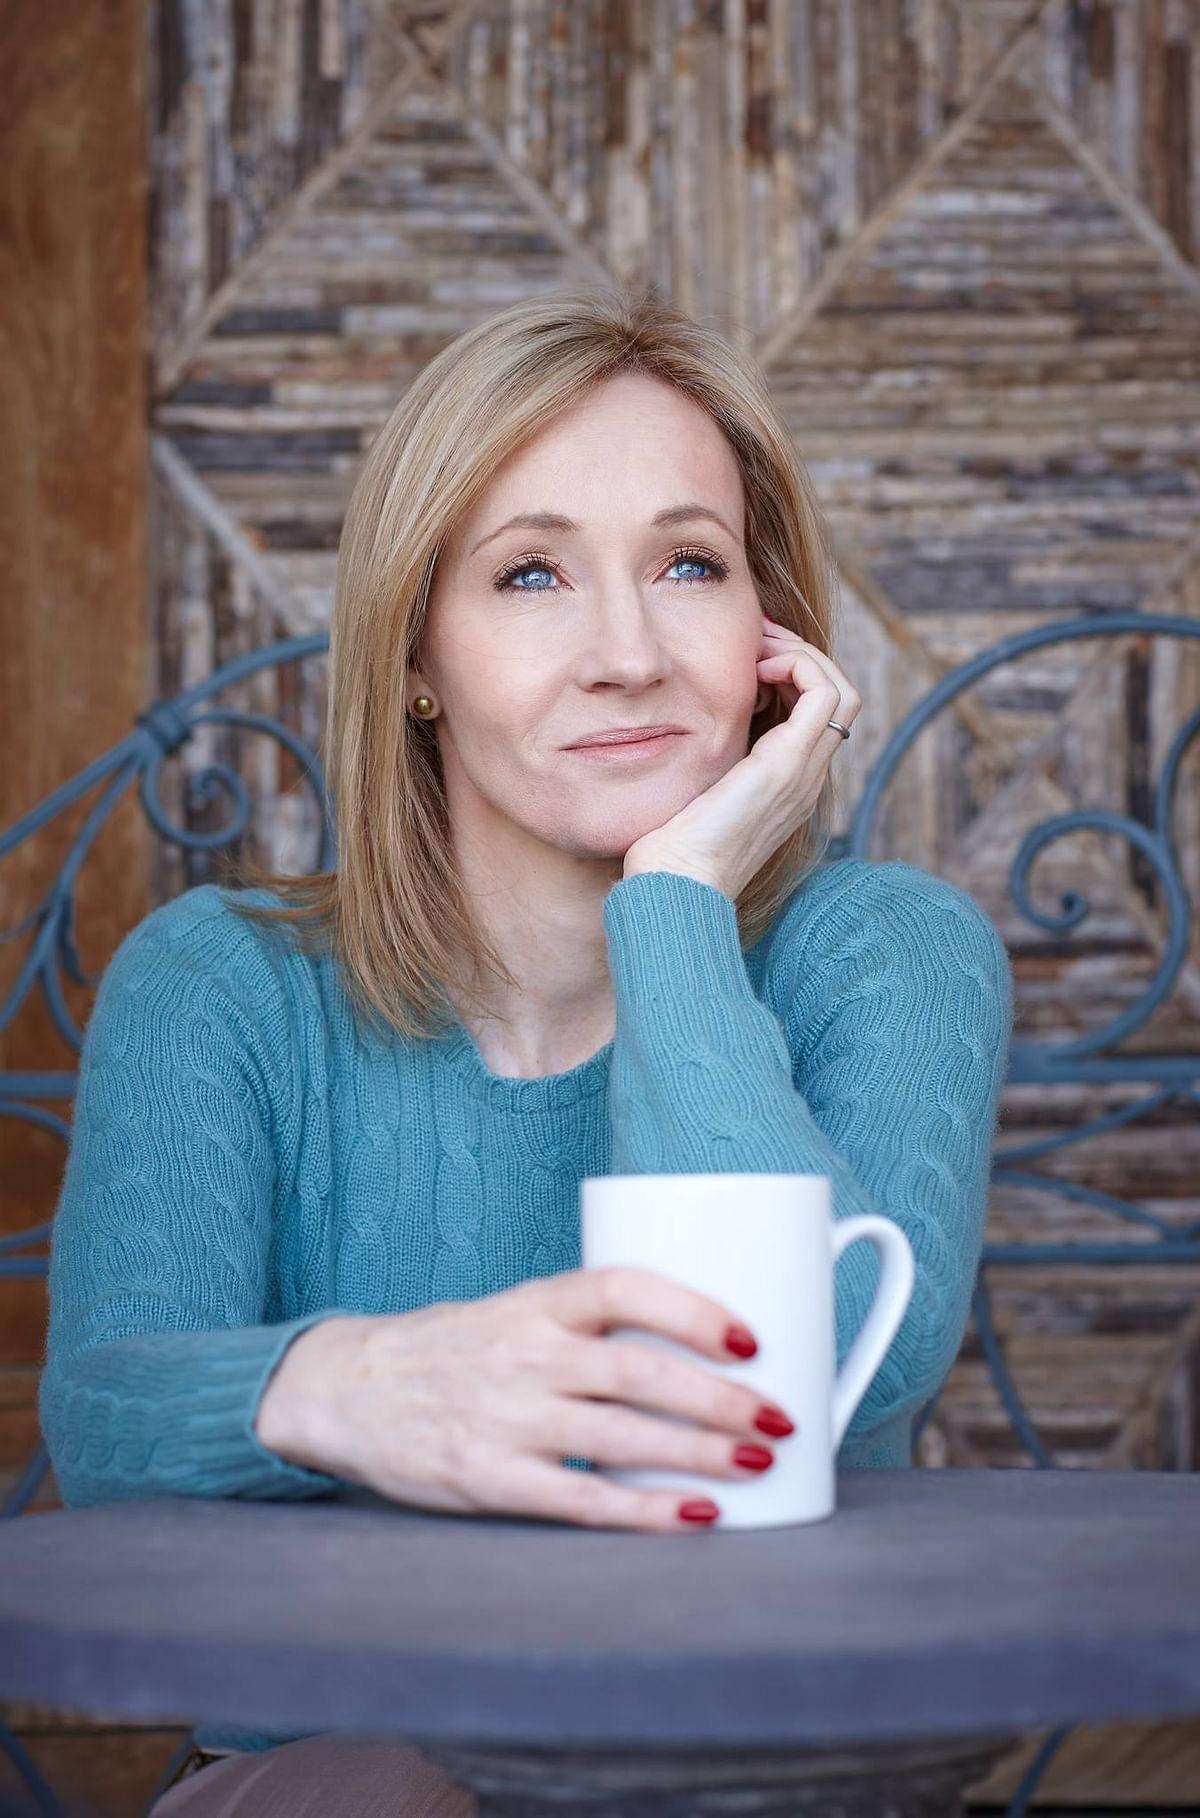 "(Photo Courtesy: <a href=""https://www.facebook.com/JKRowling?fref=ts"">Facebook/J.K. Rowling</a>)"